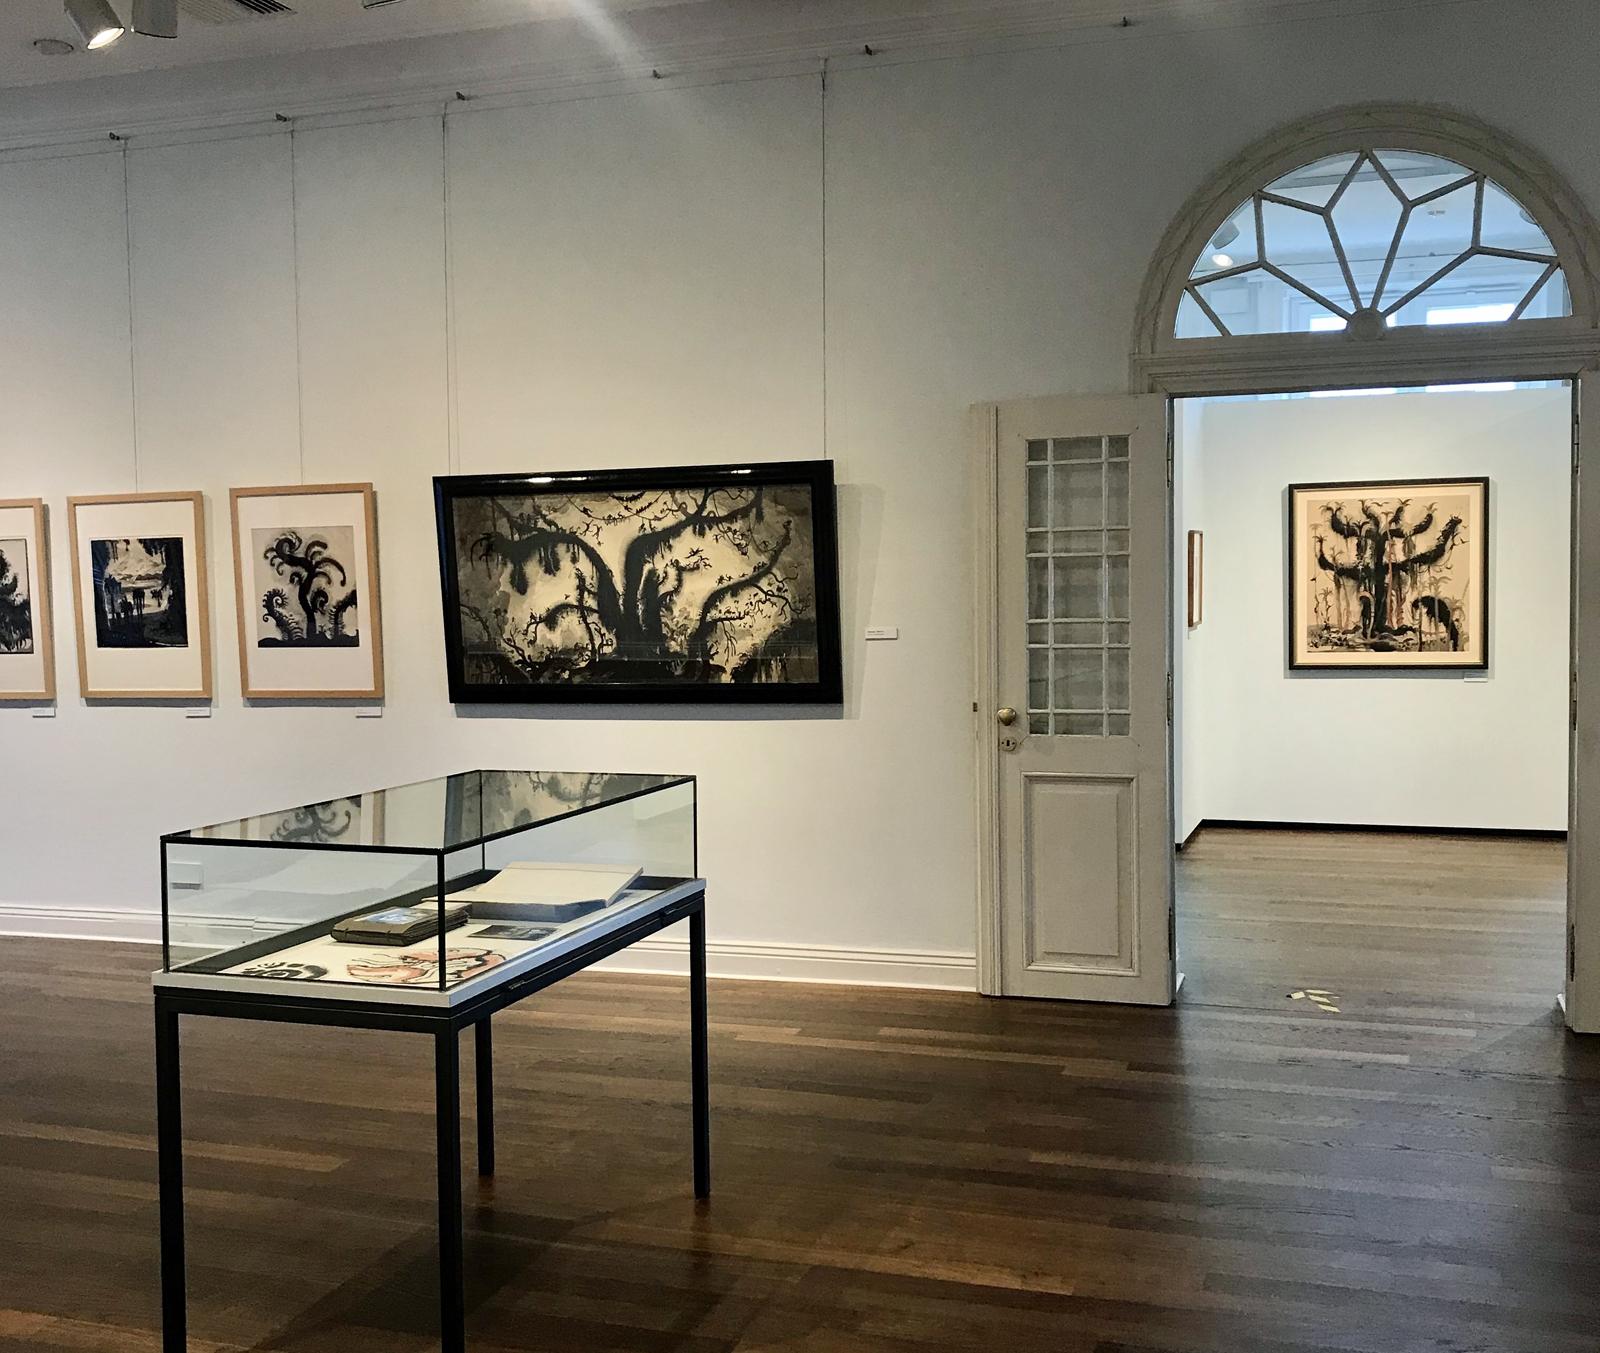 blick-in-die-ausstellung-w-hablik-tuschemalerei-wenzel-hablik-museum-itzehoe-low